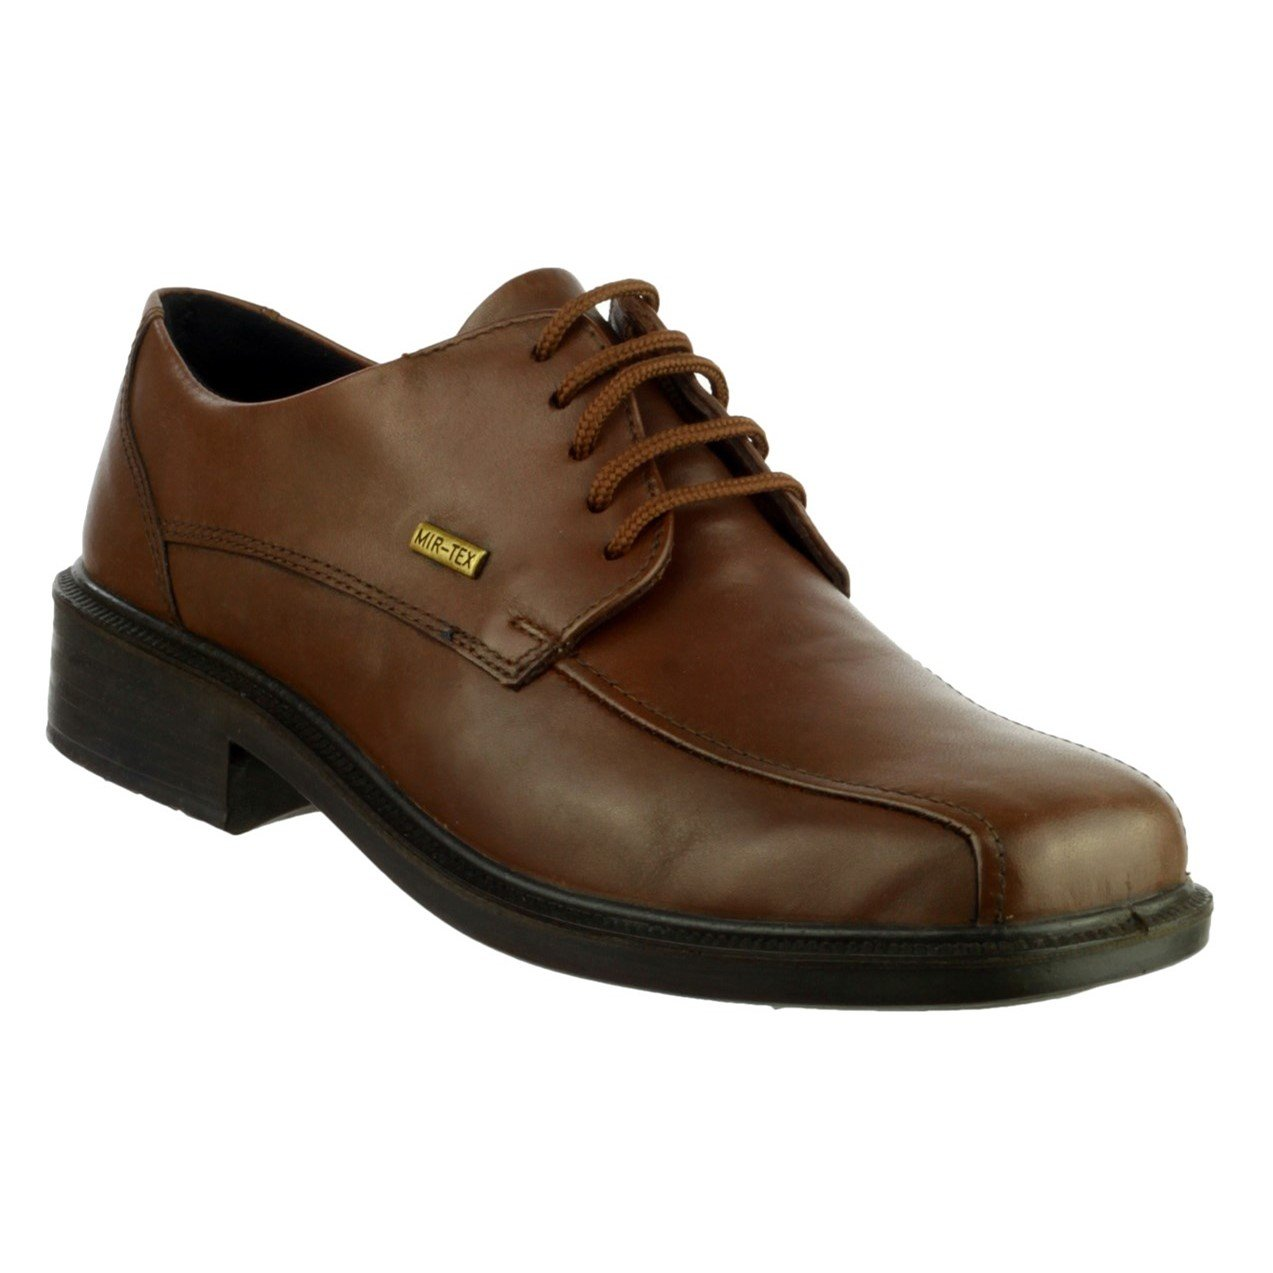 Cotswold Men's Stonehouse Waterproof Shoe Various Colours 32971 - Brown 8